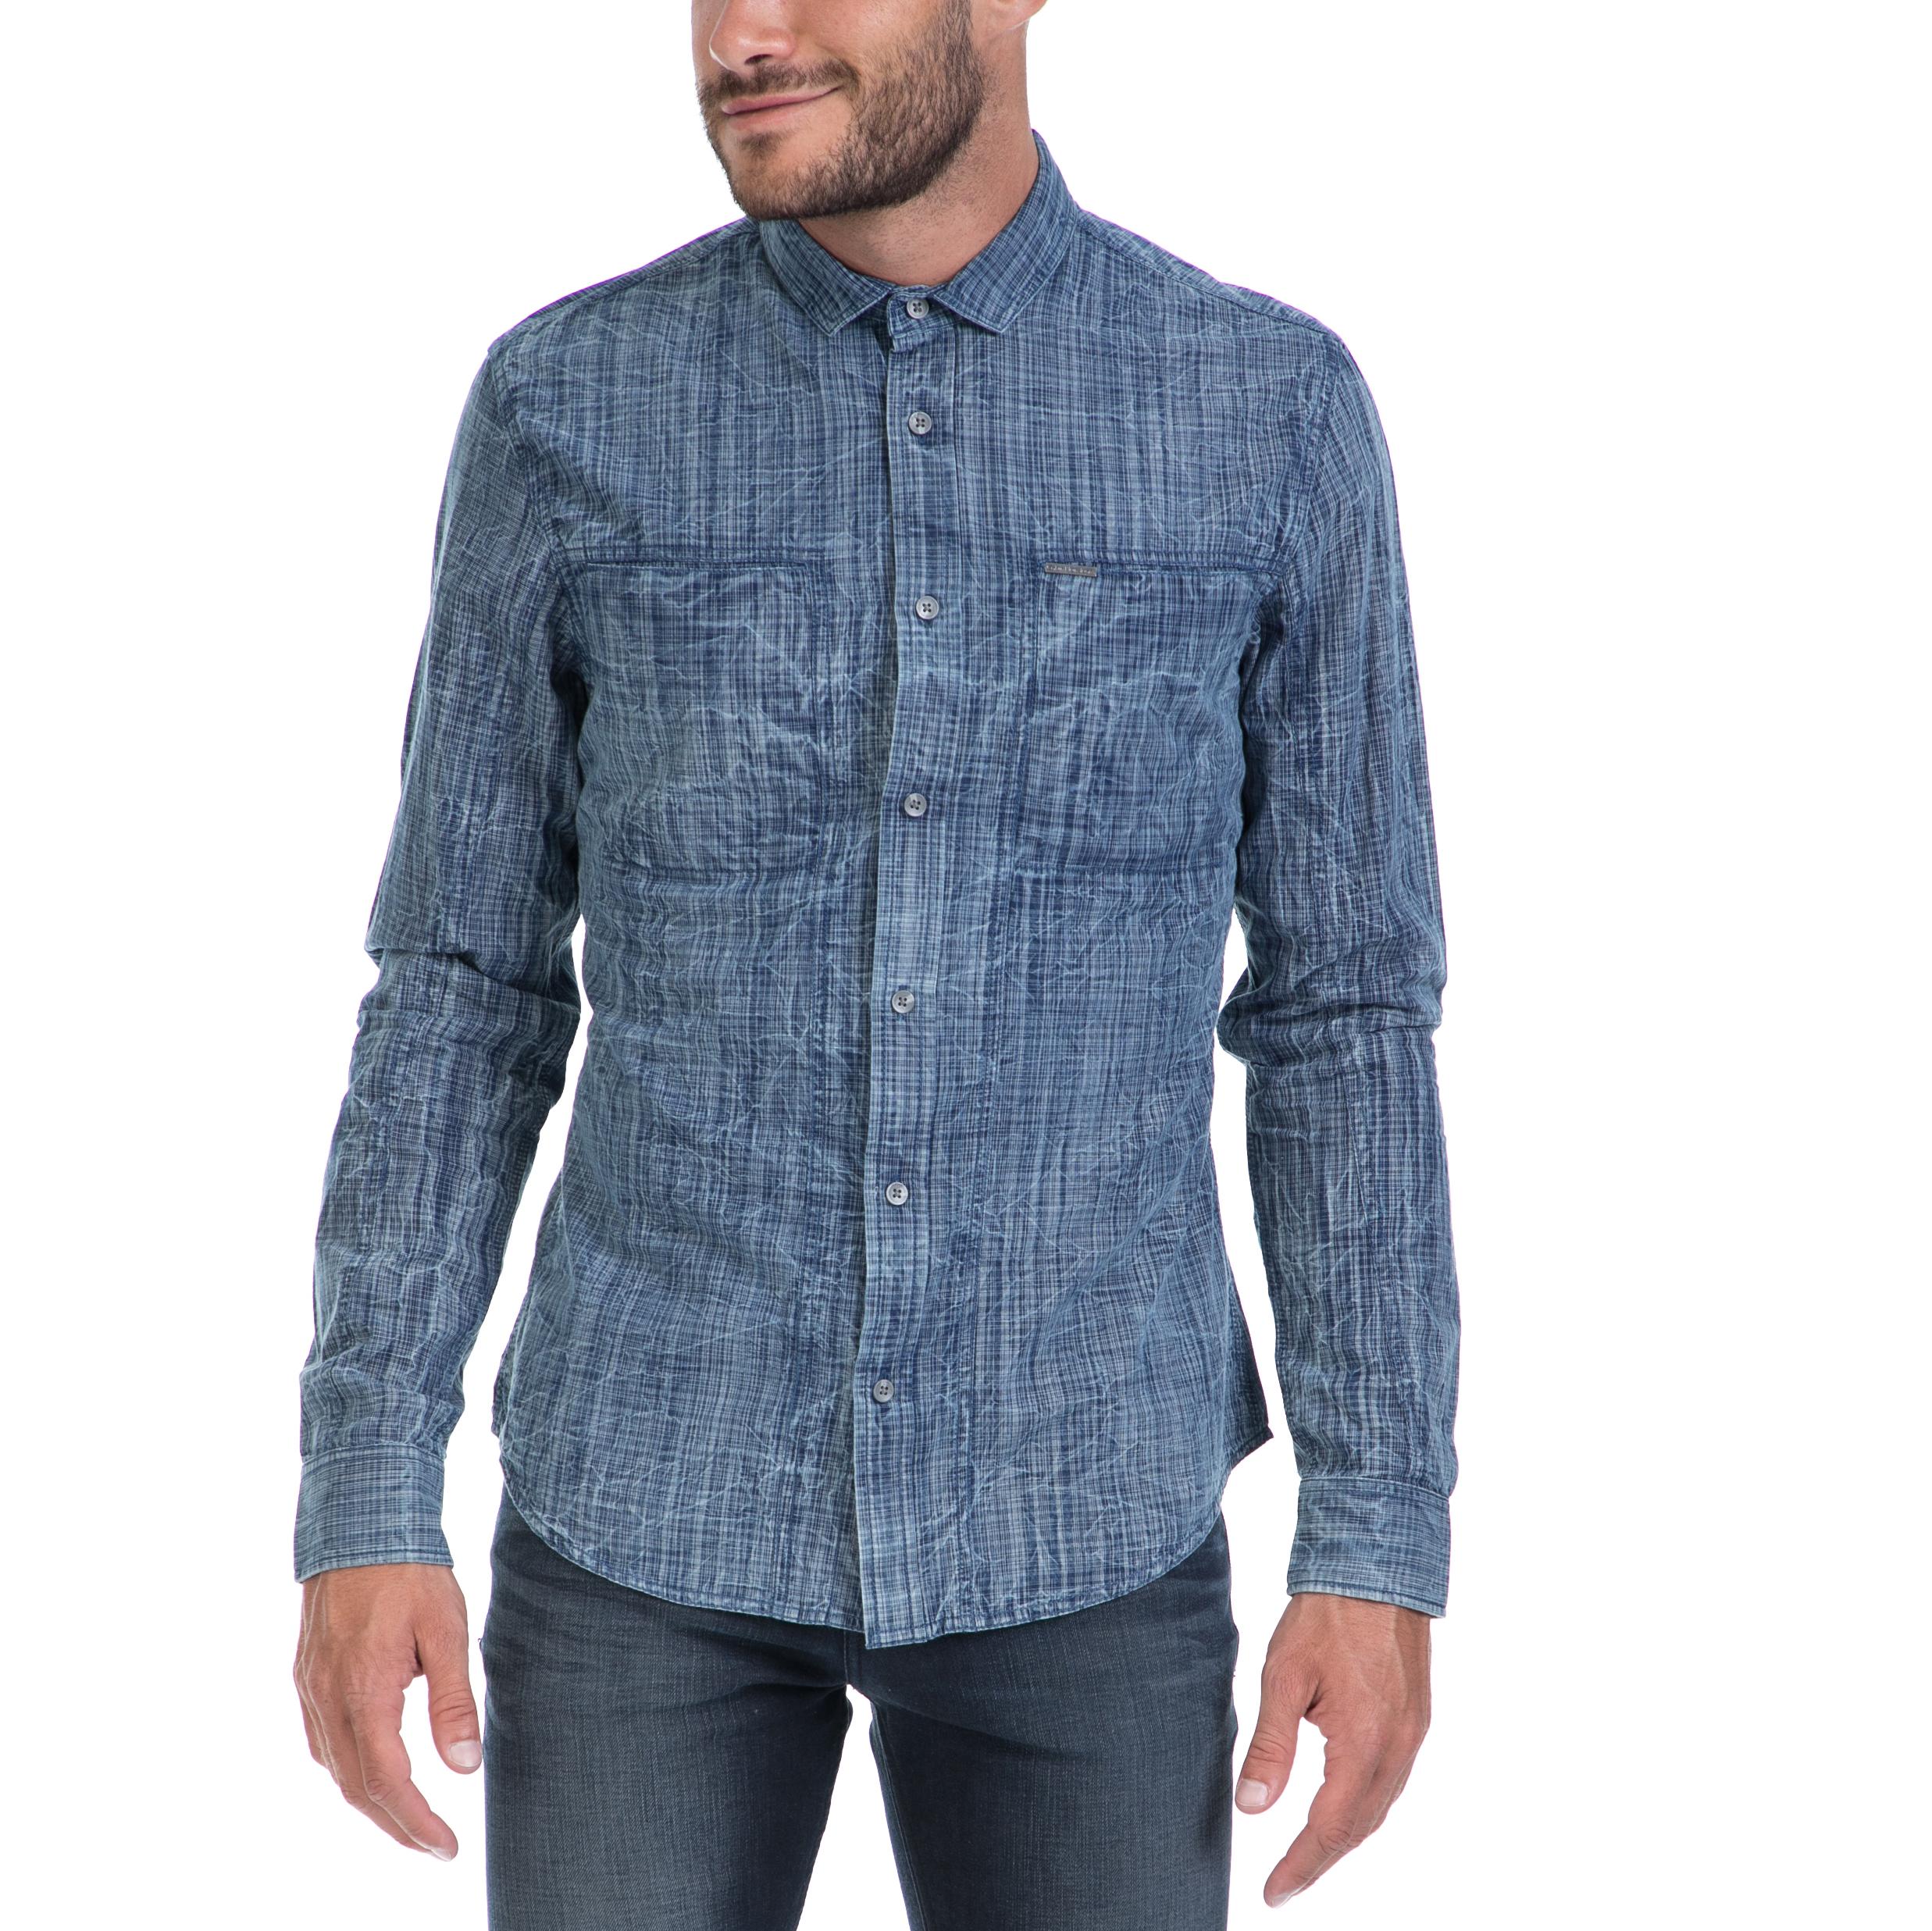 925524459fda CALVIN KLEIN JEANS – Αντρικό πουκάμισο CALVIN KLEIN JEANS μπλε  1502842.0-00J2